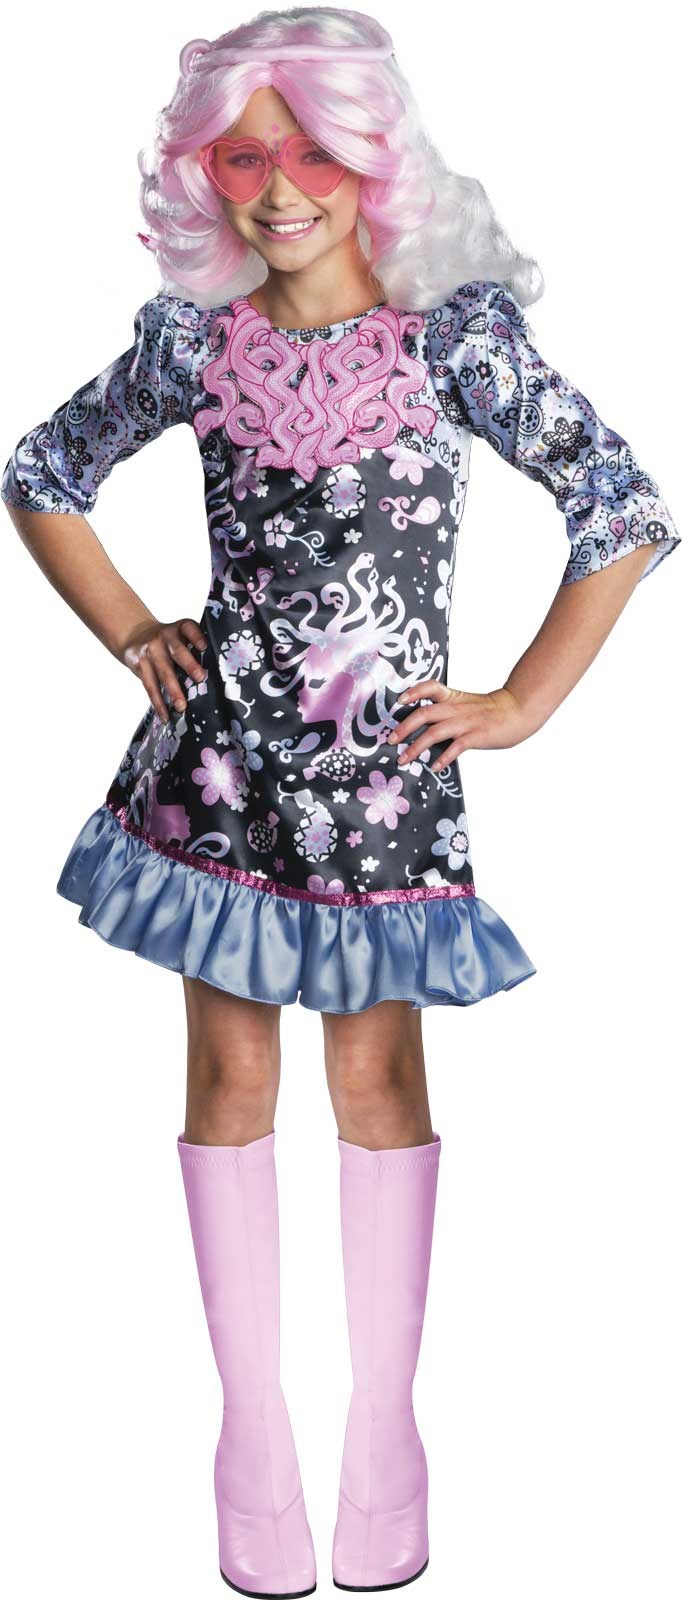 Monster High Halloween Costumes For Kids